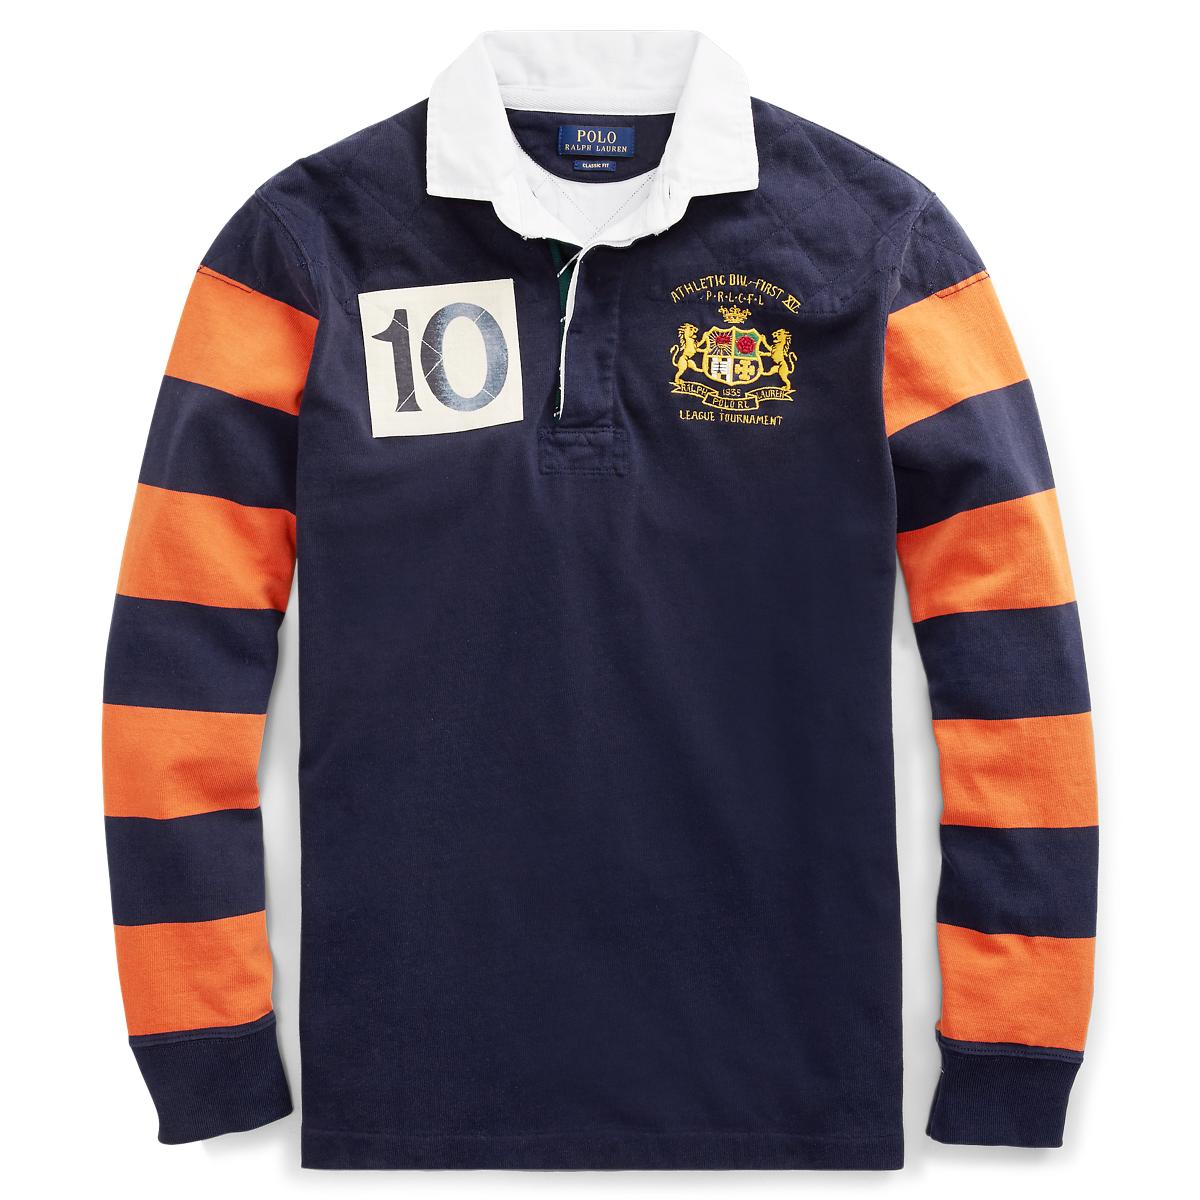 cc6cbf8f8 Classic Fit Cotton Rugby Shirt